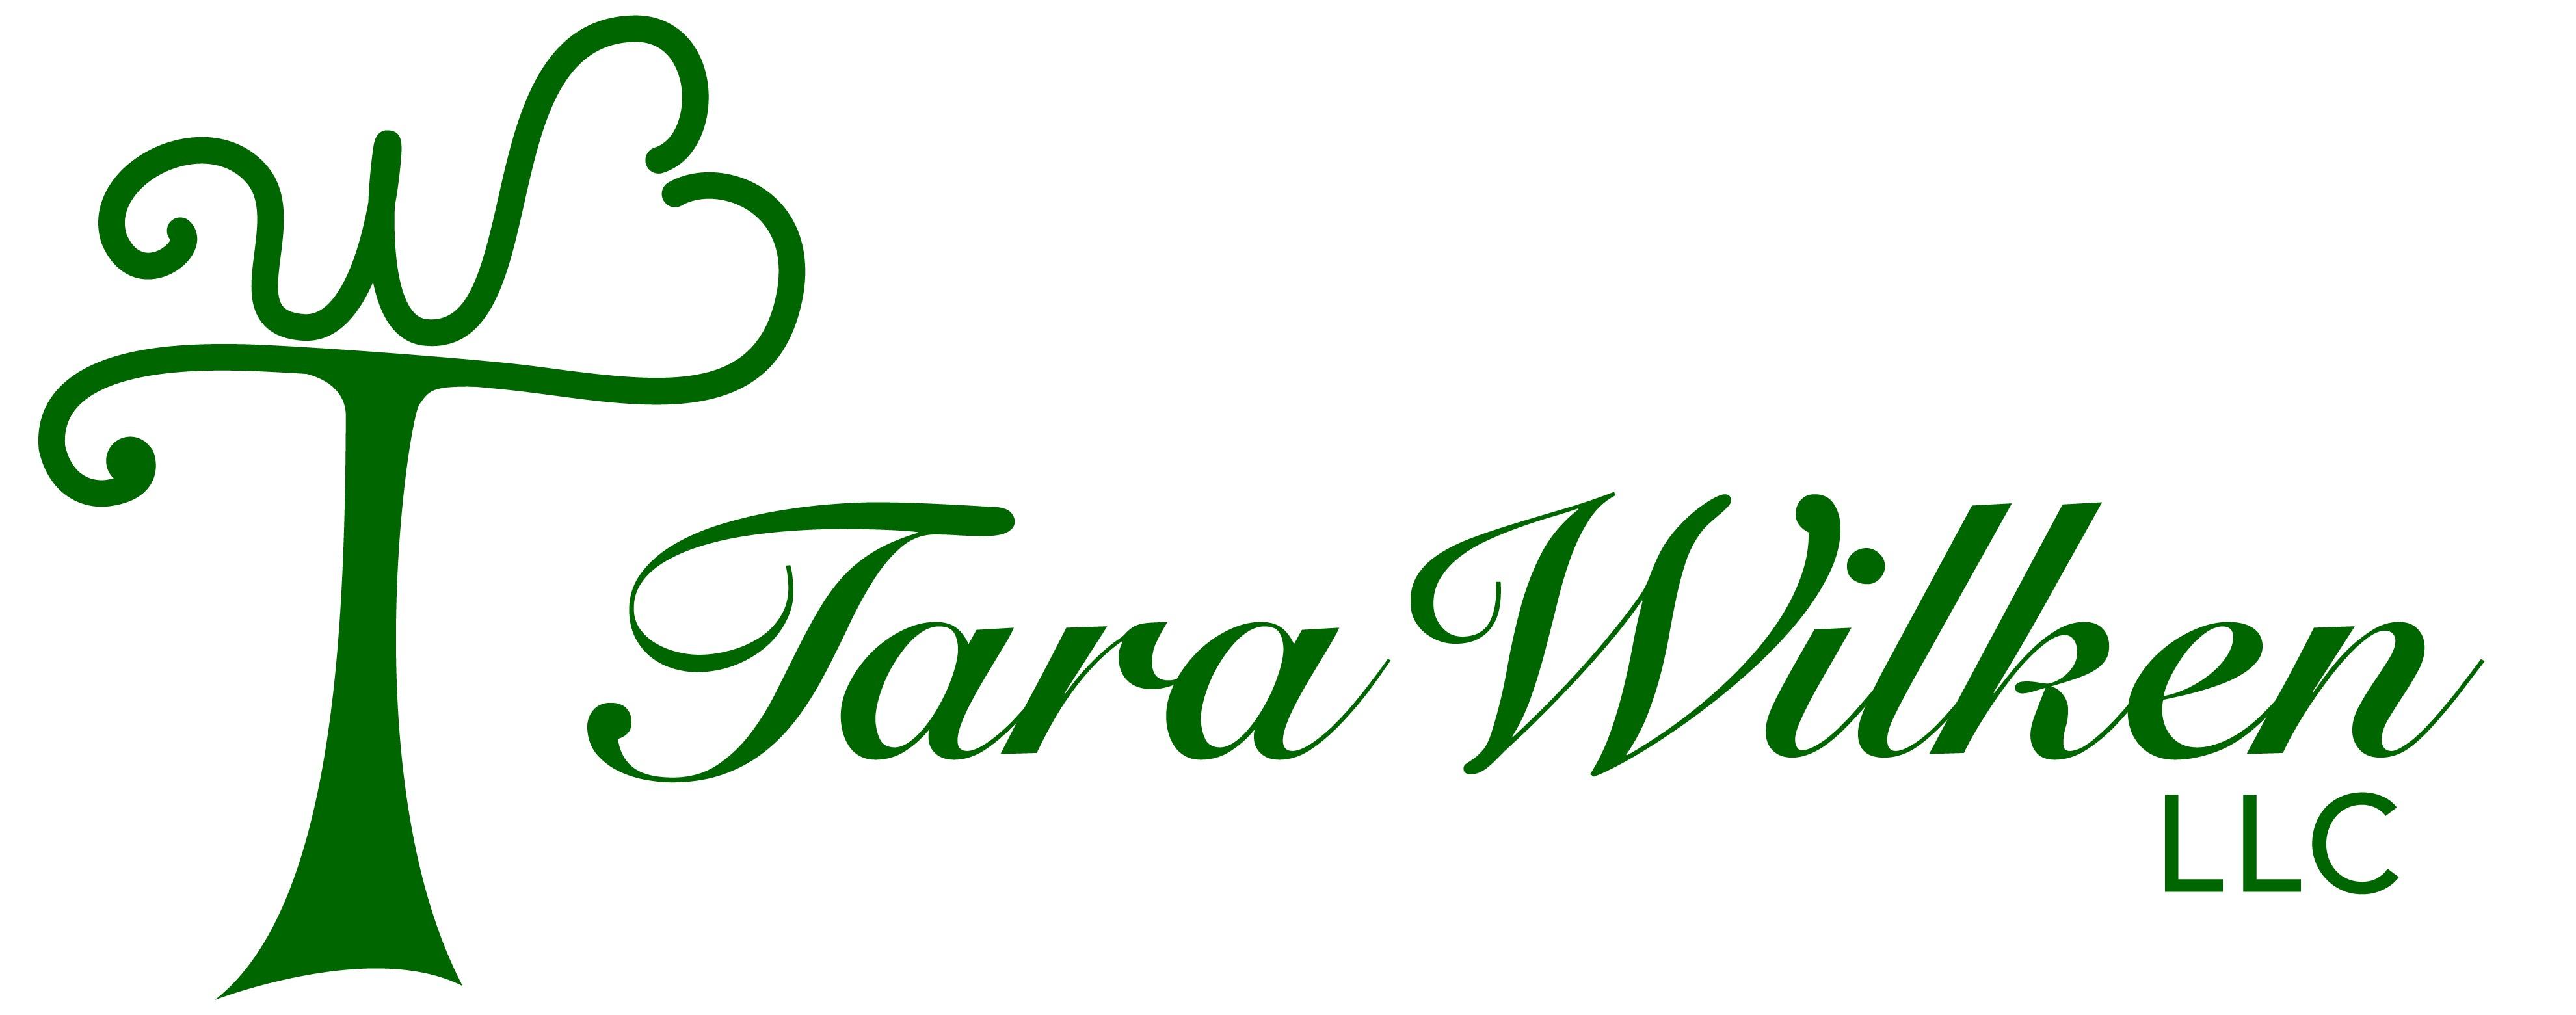 Tara Wilken LLC